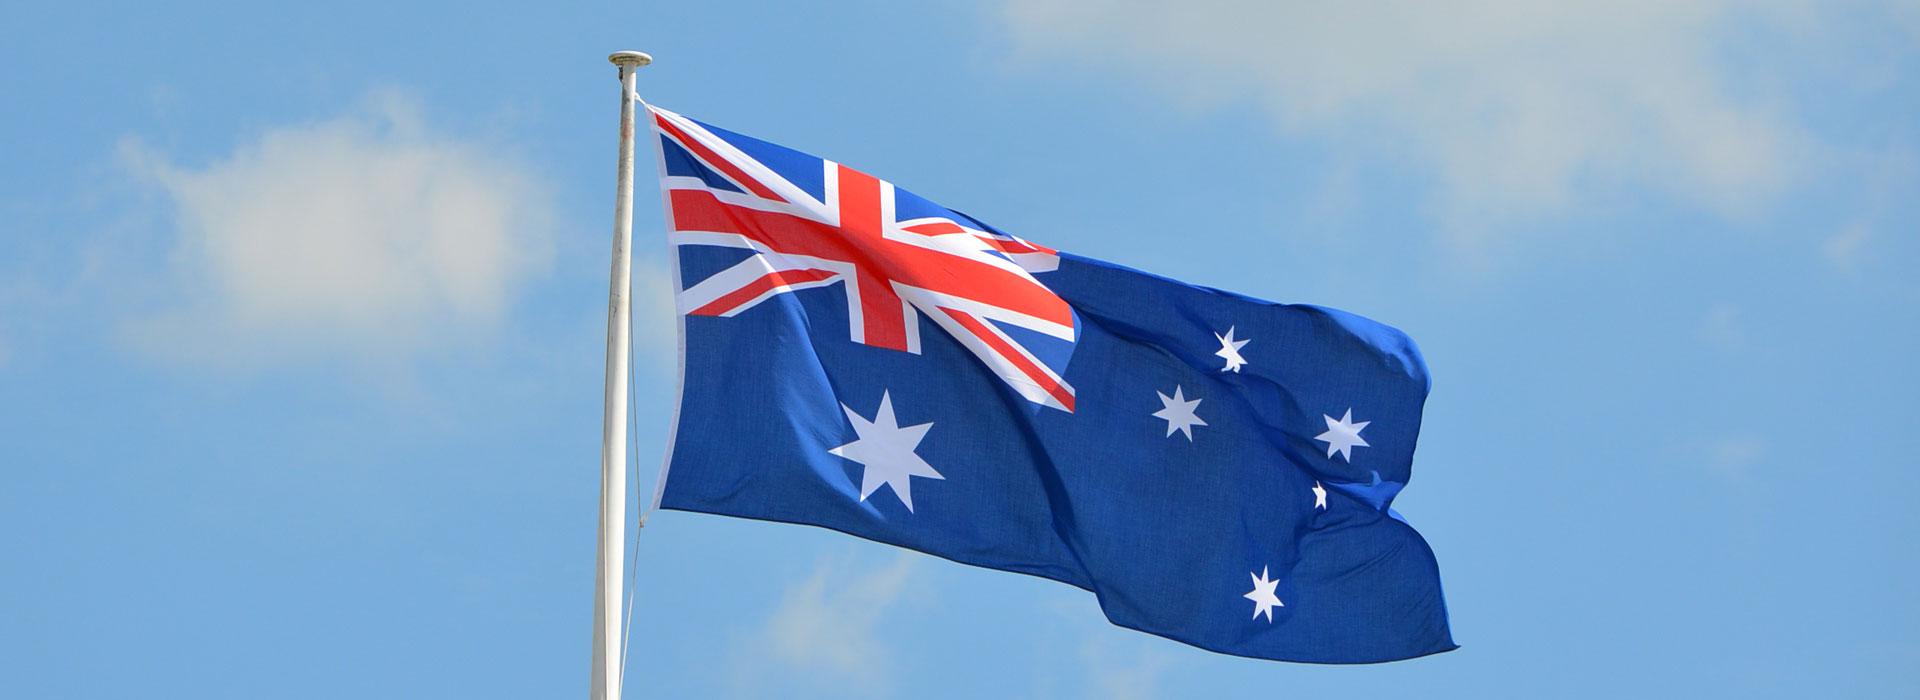 australian-flag-banners